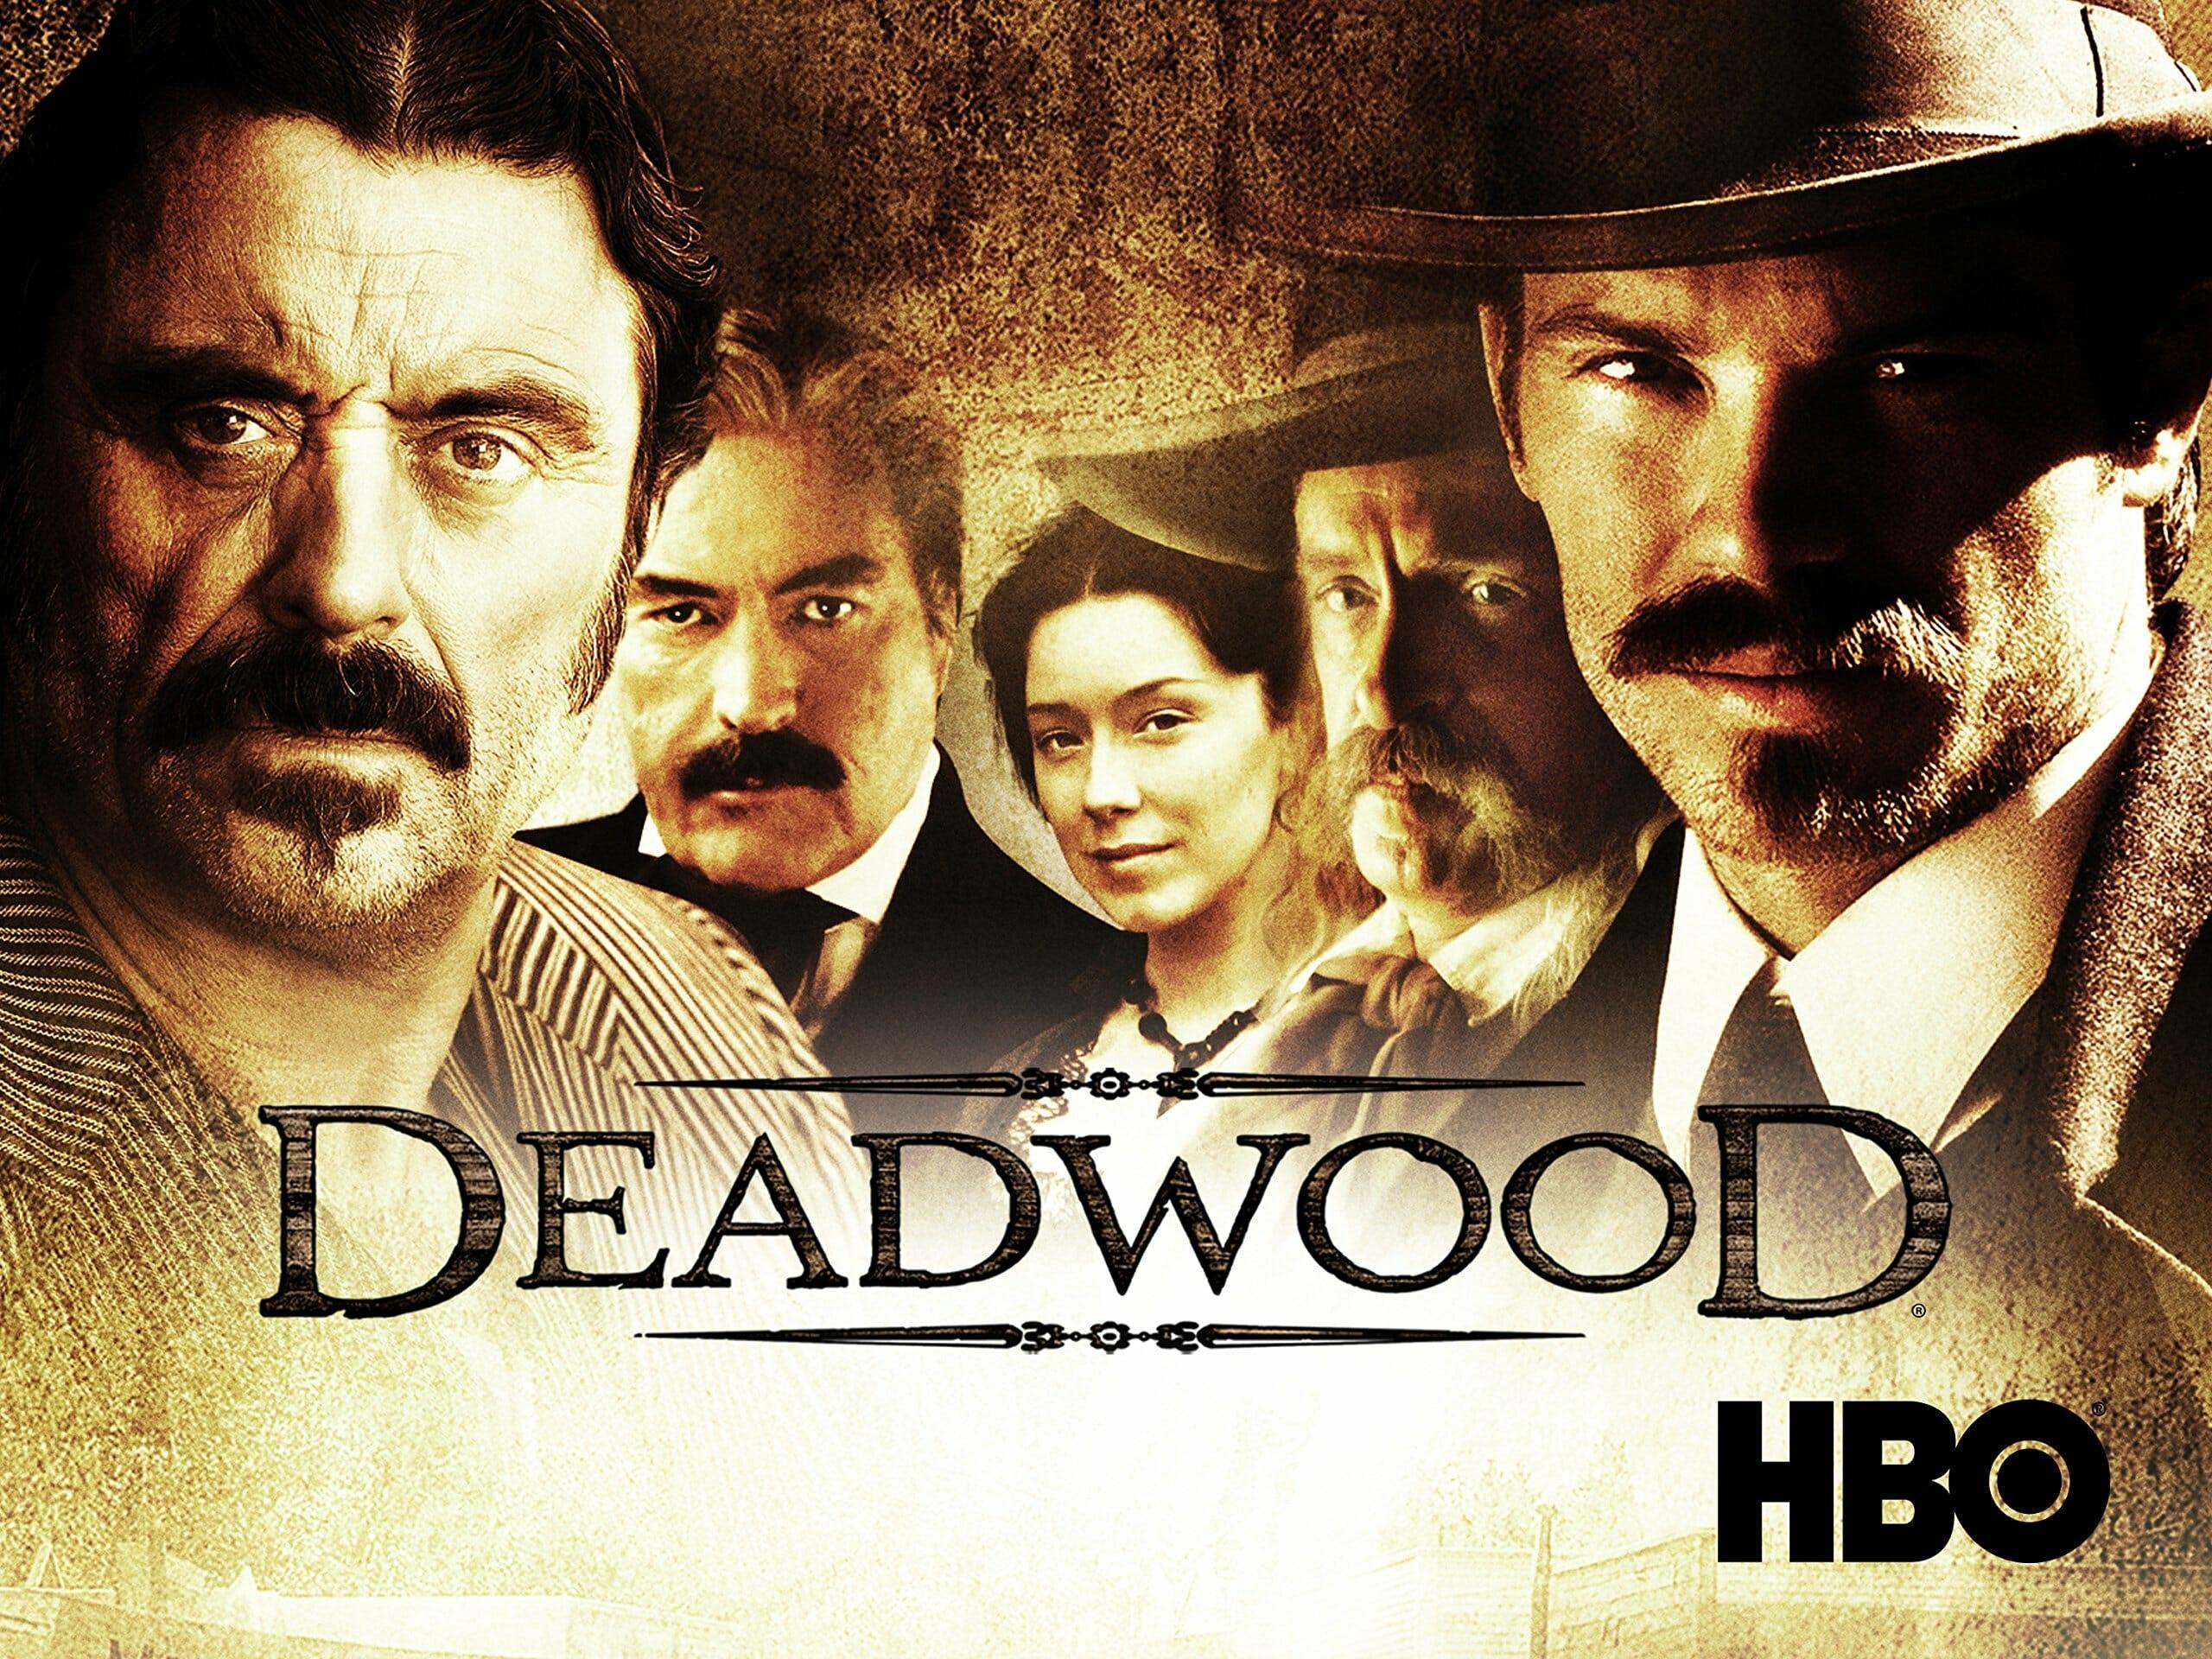 watch deadwood the movie online free on amazon